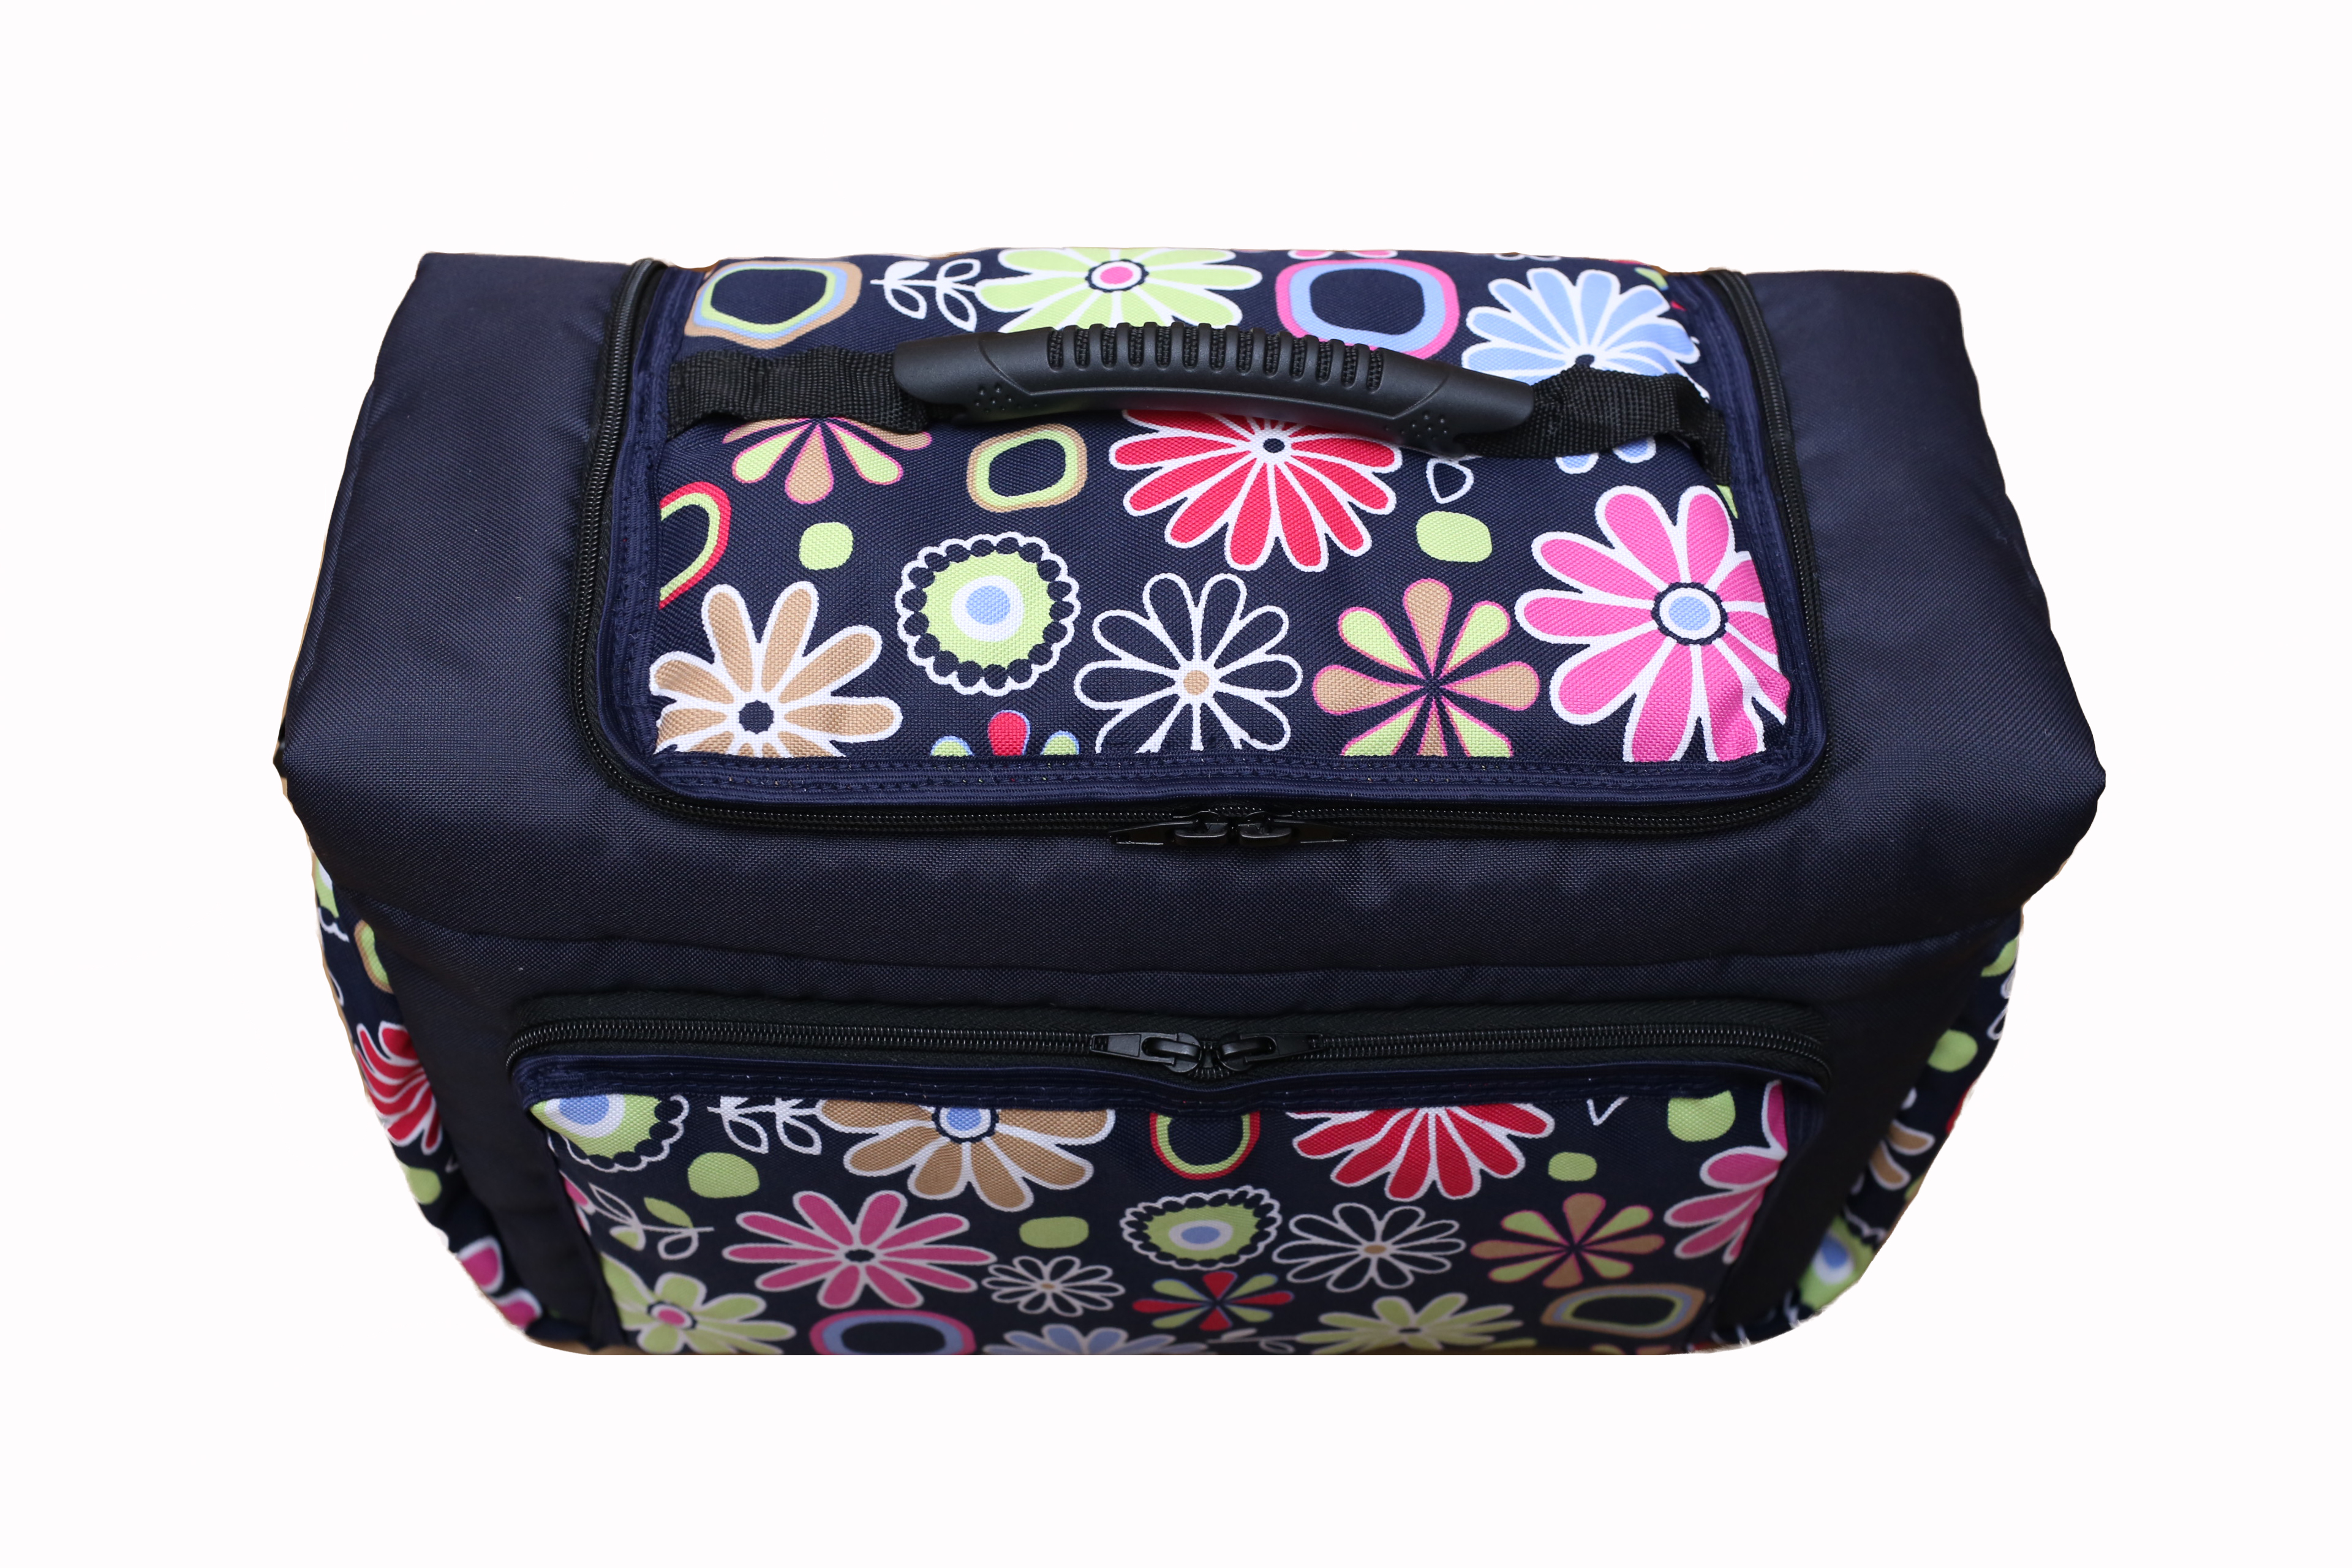 diaper bag kim baby joy xxl xxxl plus size diaper changing ebay. Black Bedroom Furniture Sets. Home Design Ideas